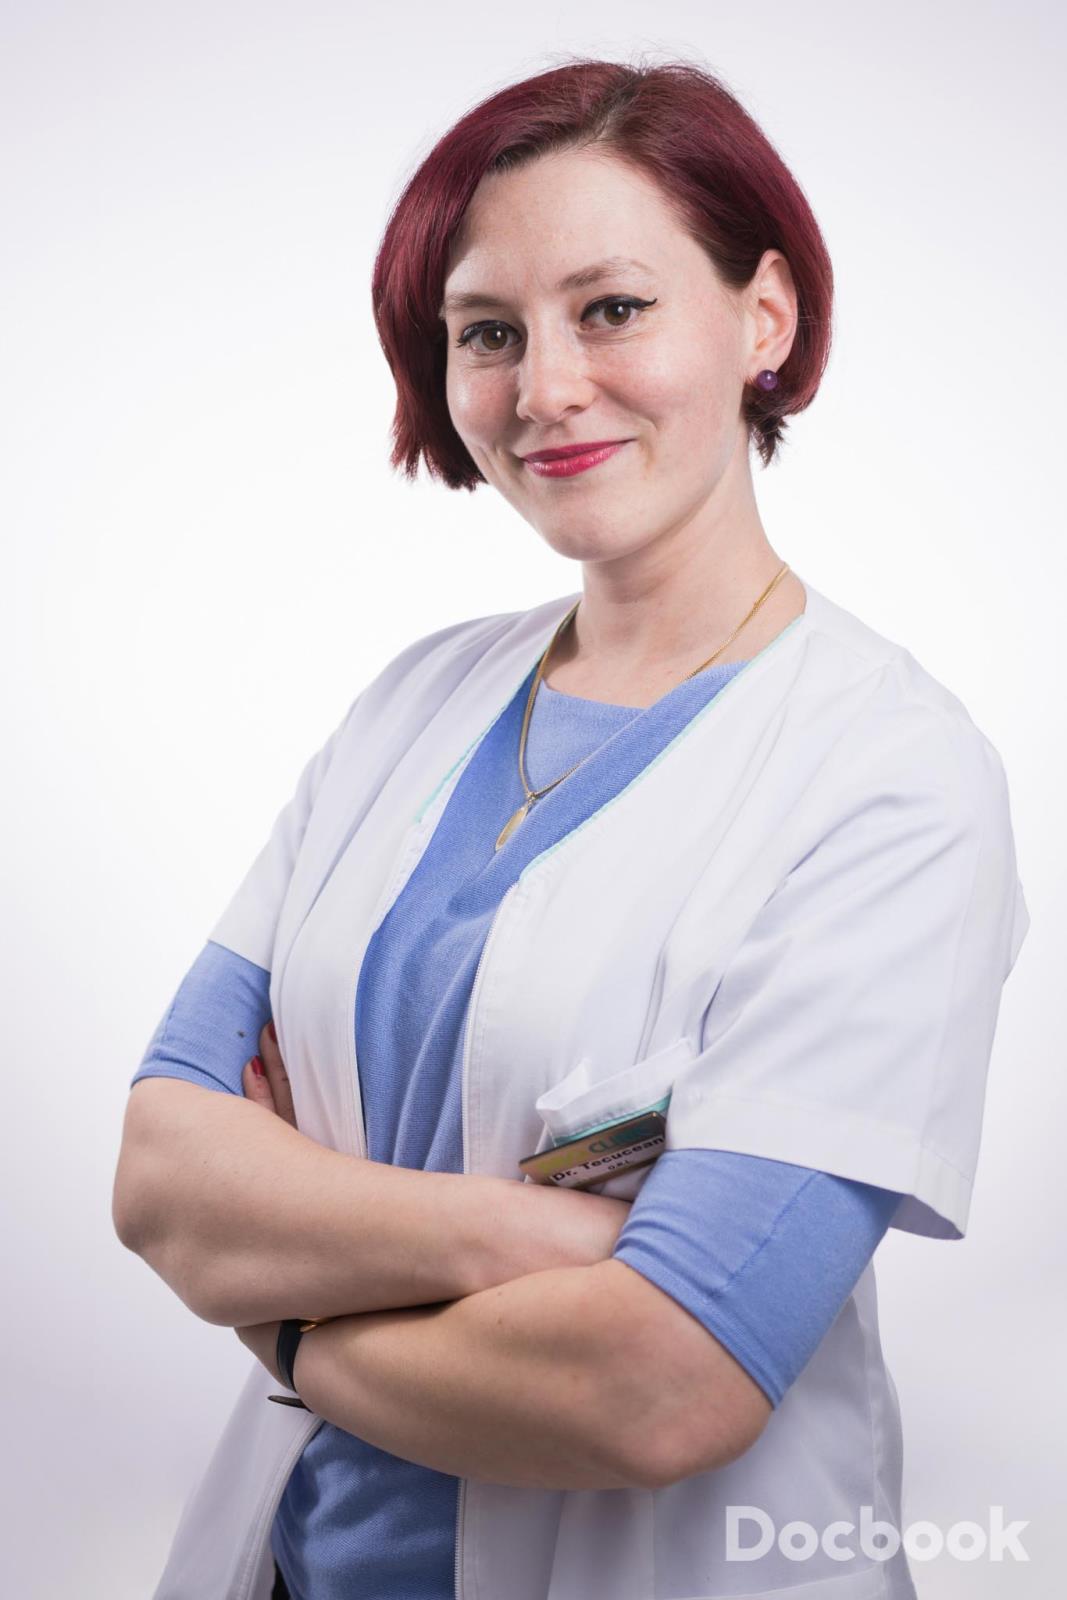 Dr. Ioana Tecuceanu